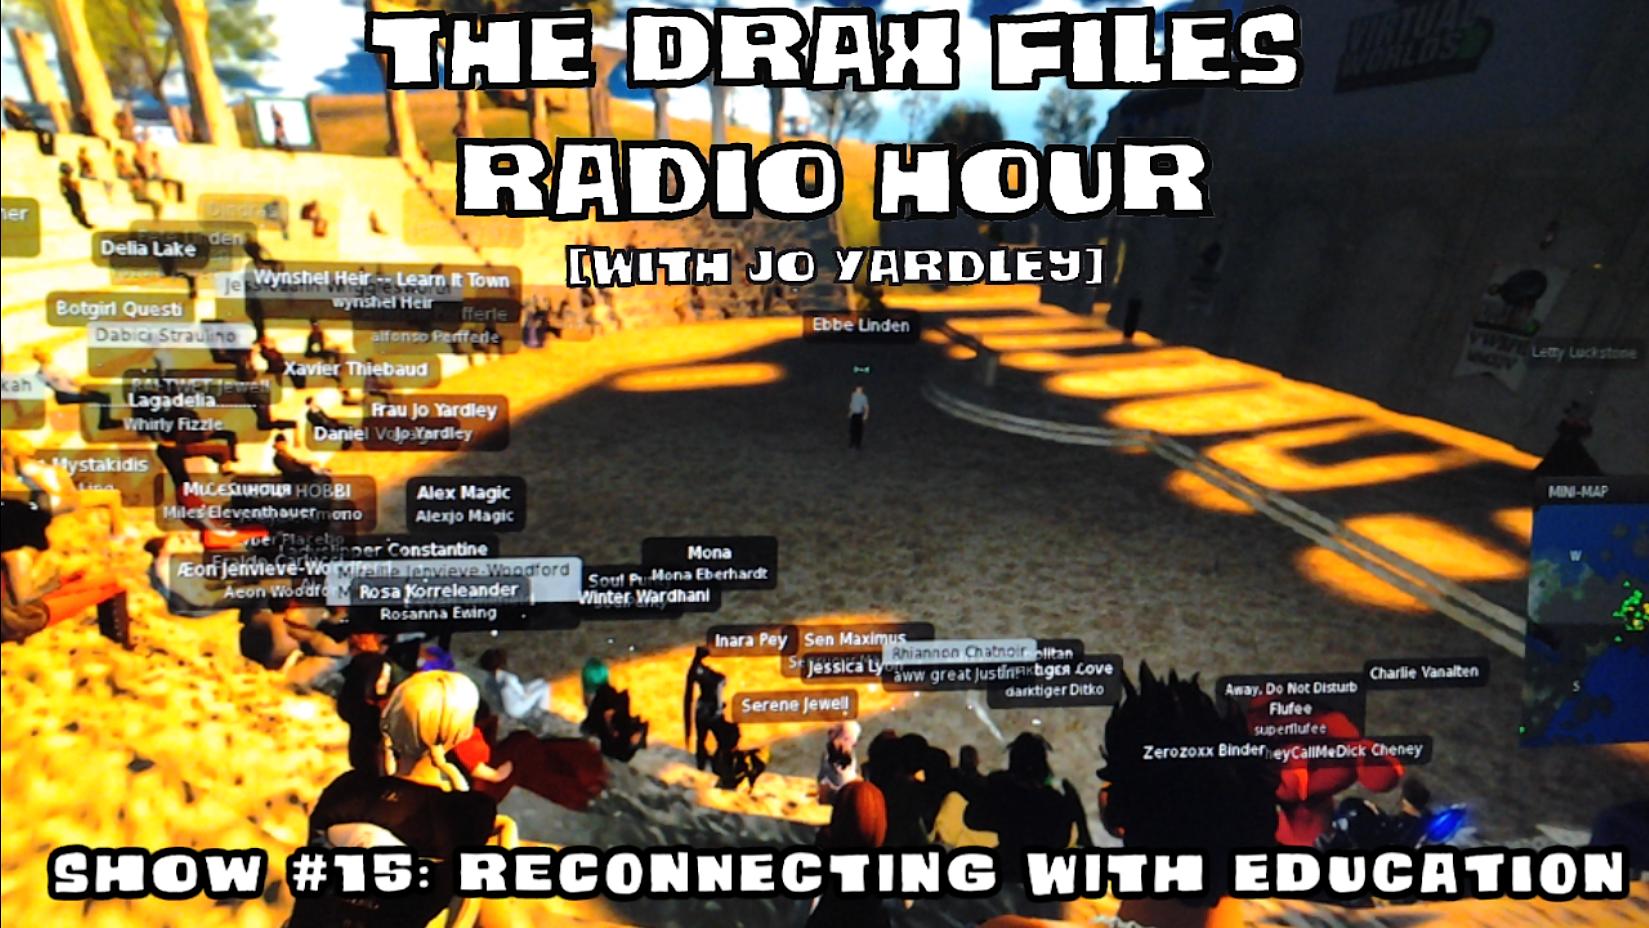 The Drax Files Radio Hour, Show #15. Image courtesy of Draxtor Despres.